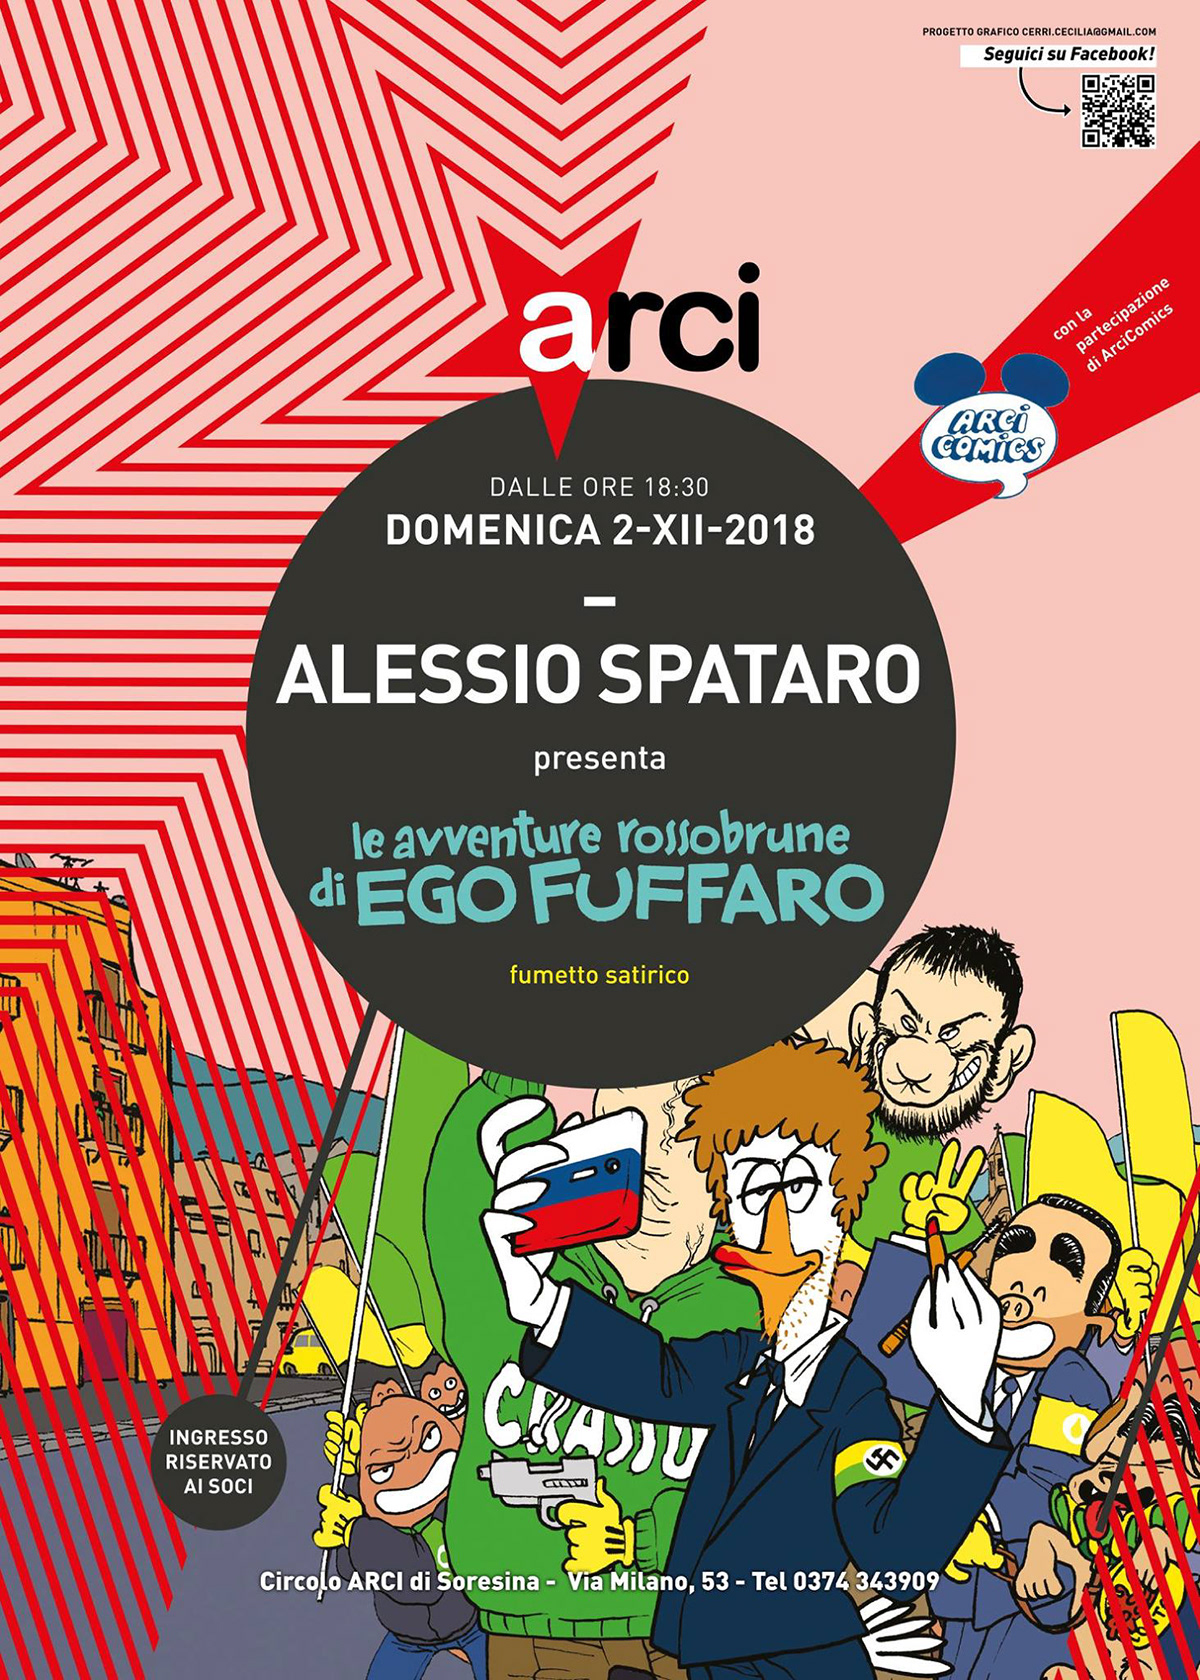 ARCI concert Event facebook flyer music poster punk rock